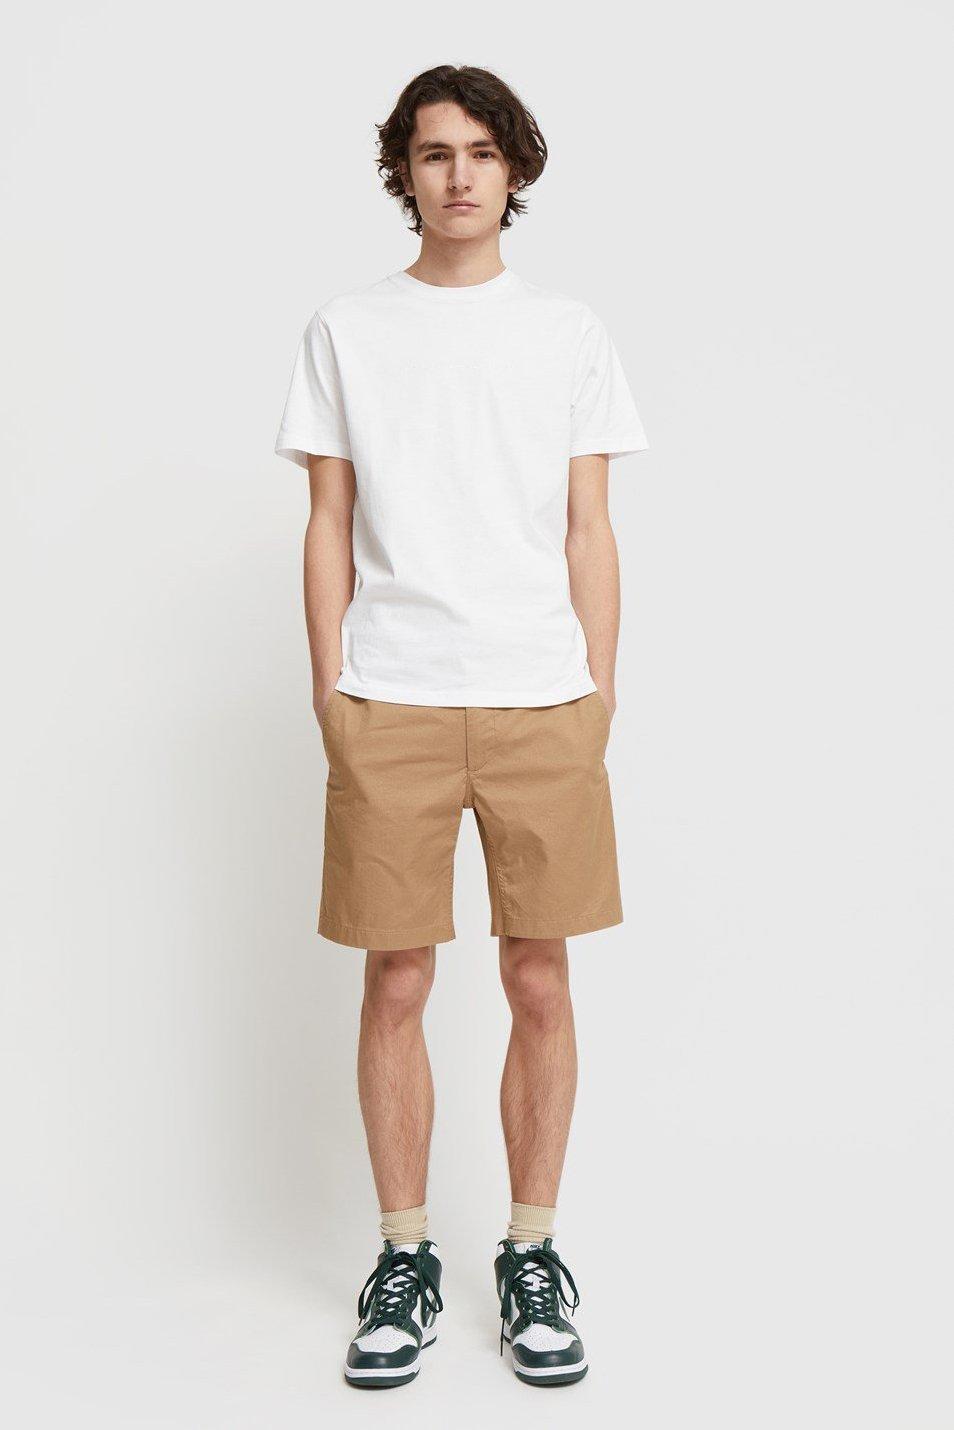 Wood Wood Jonathan Light Twill shorts, khaki, 34